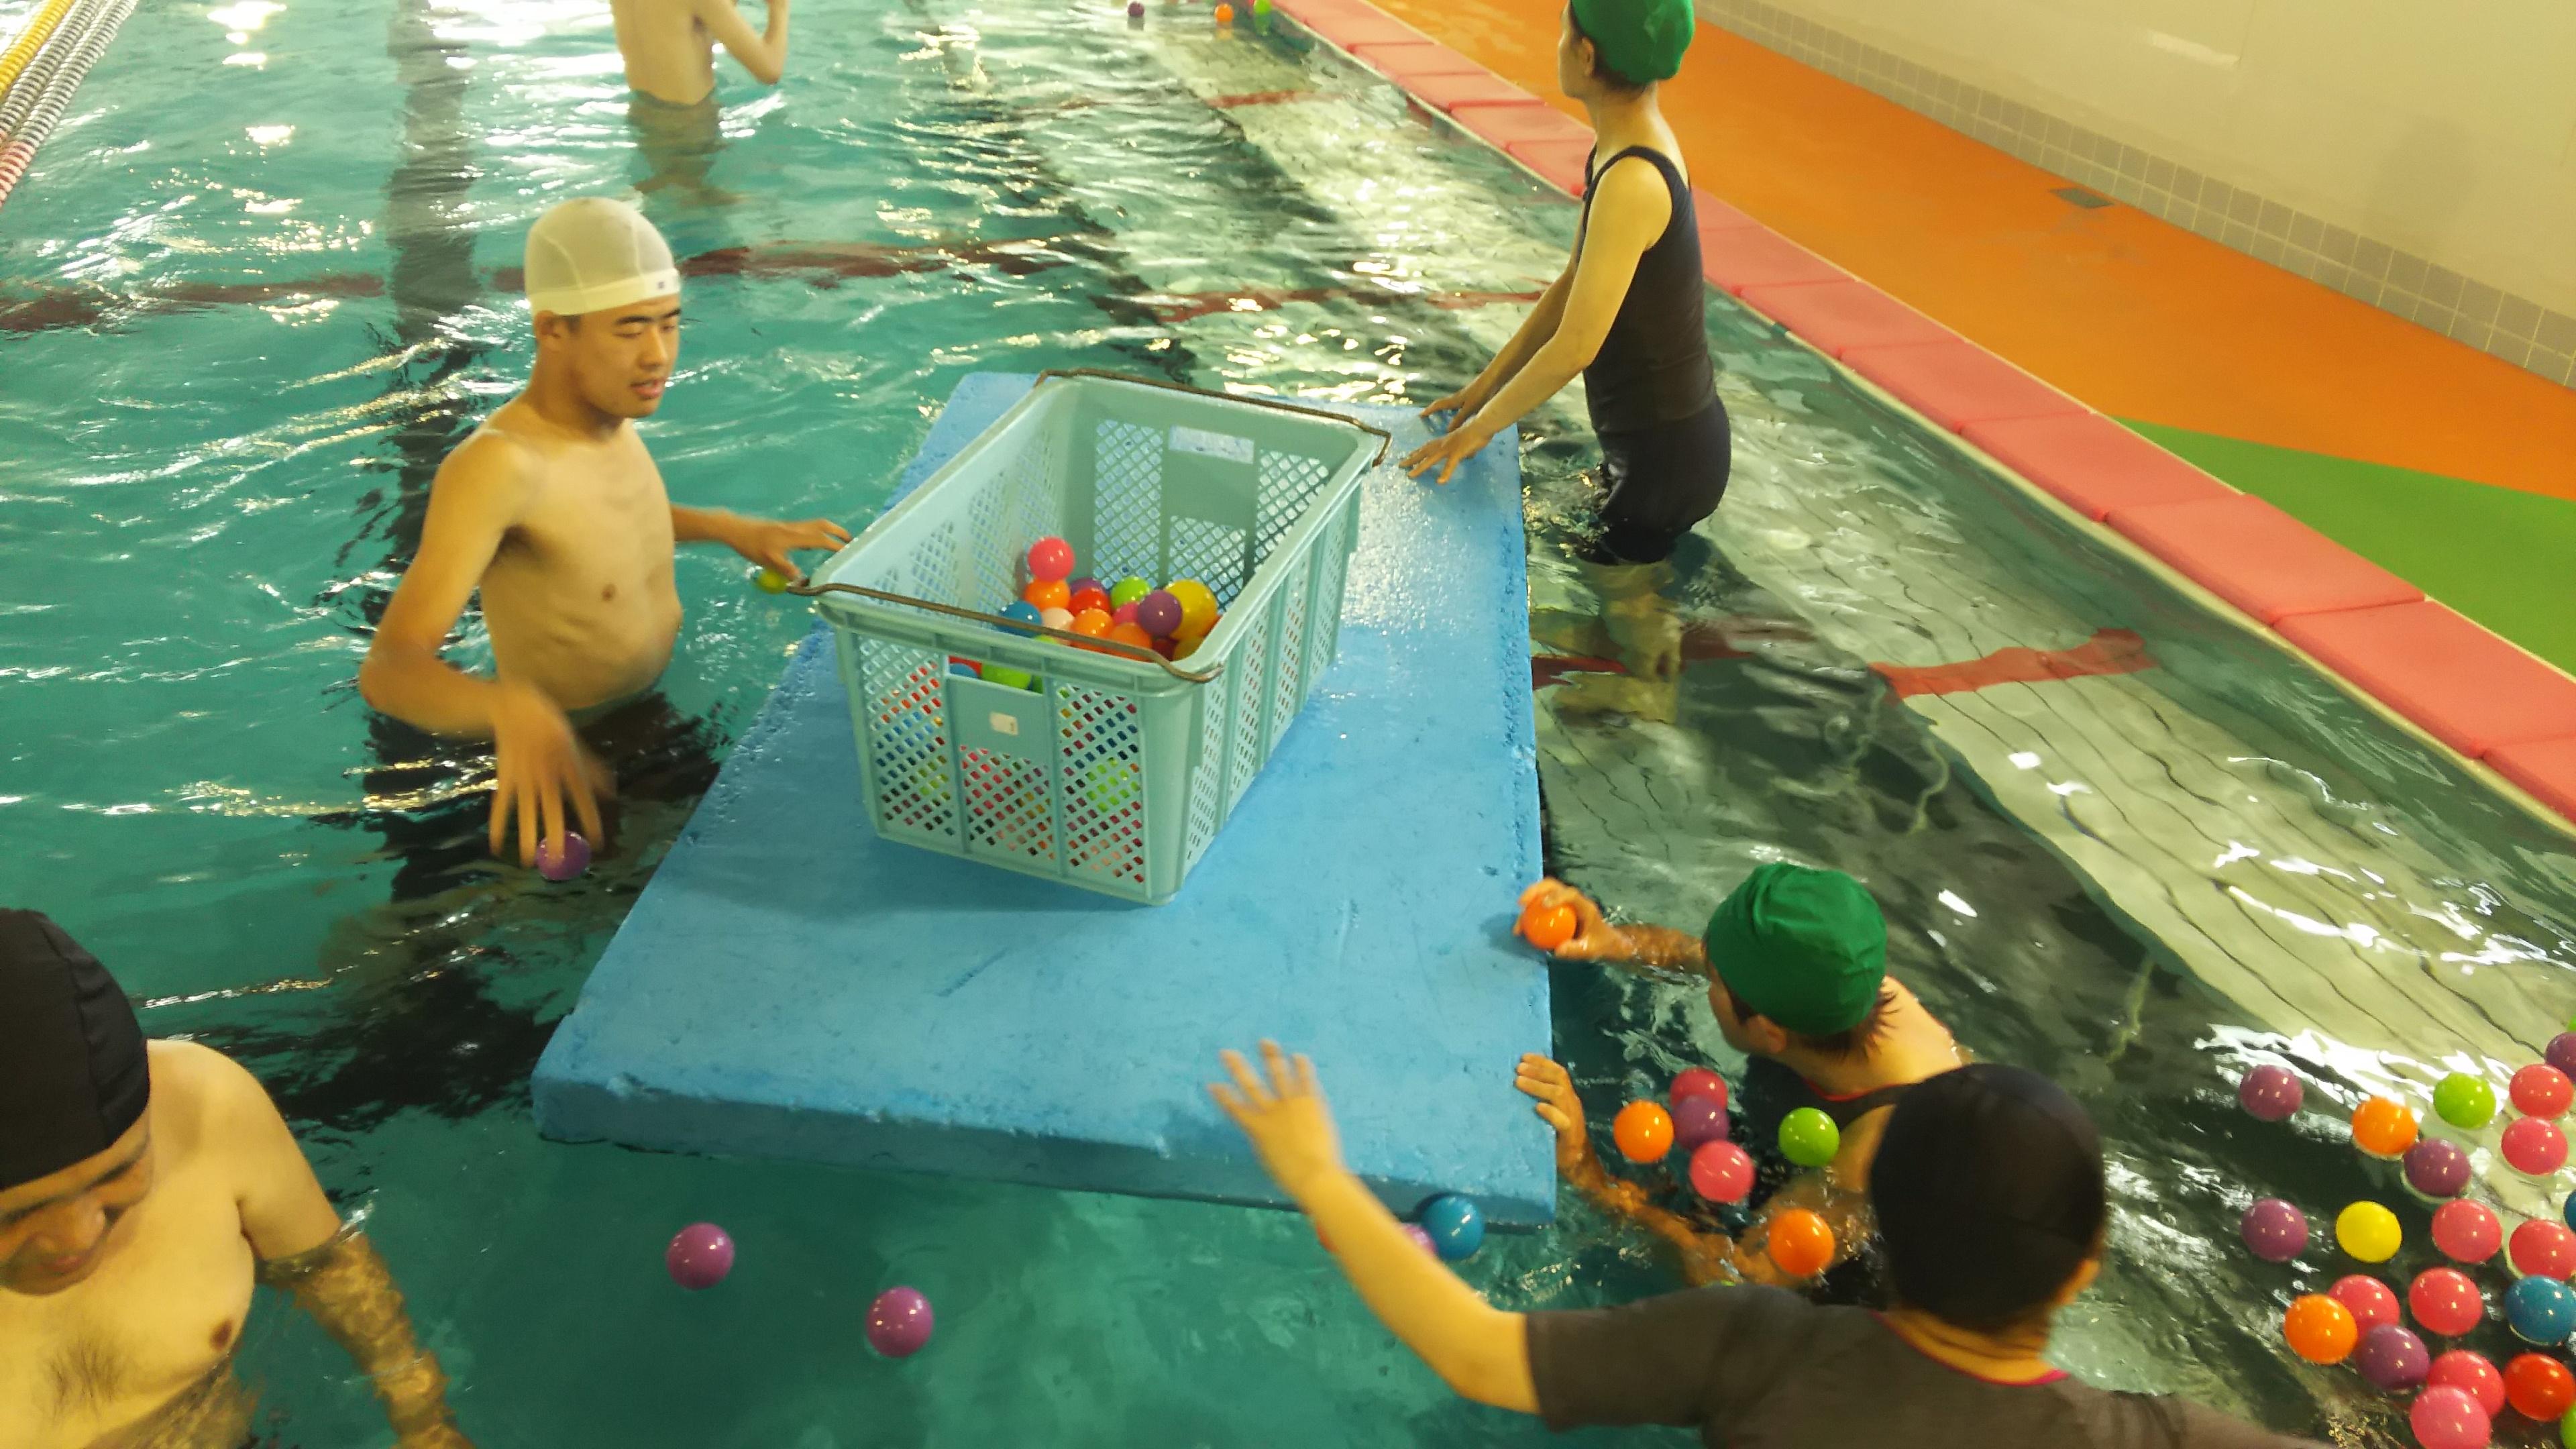 今日の水泳教室~生活介護~